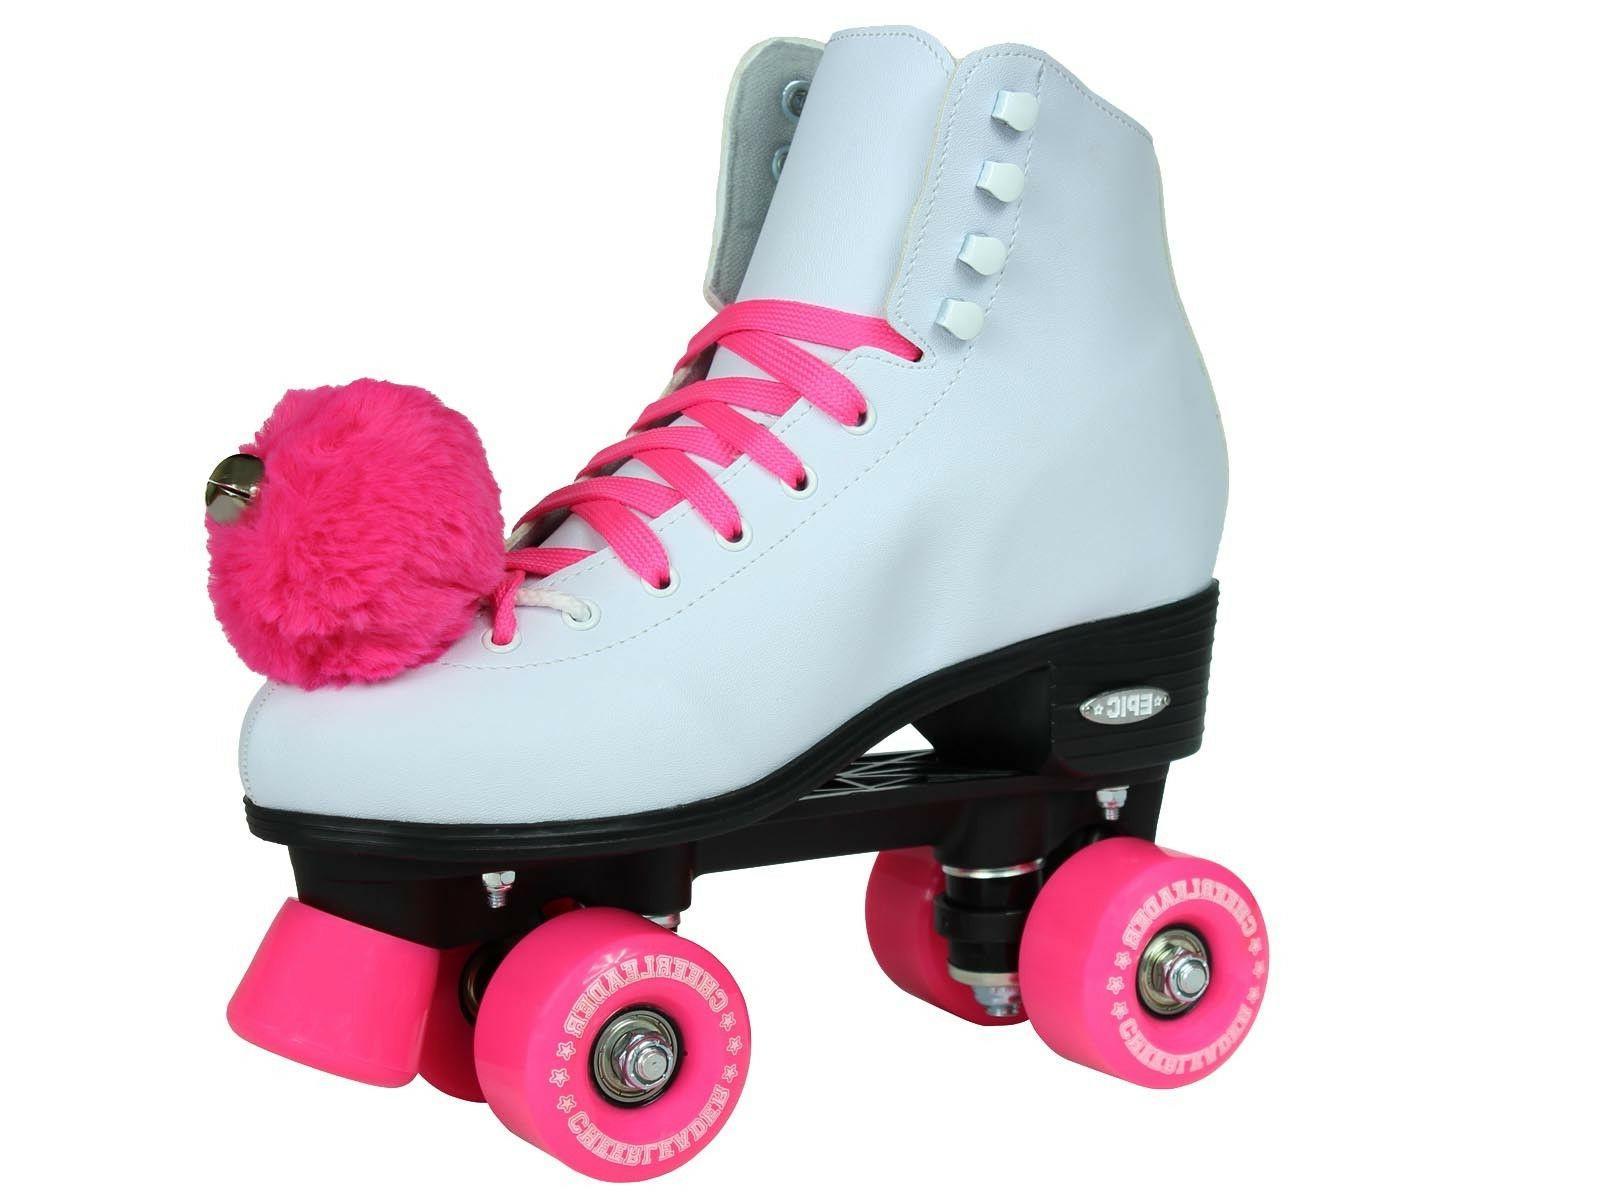 Epic Pink Quad Skates